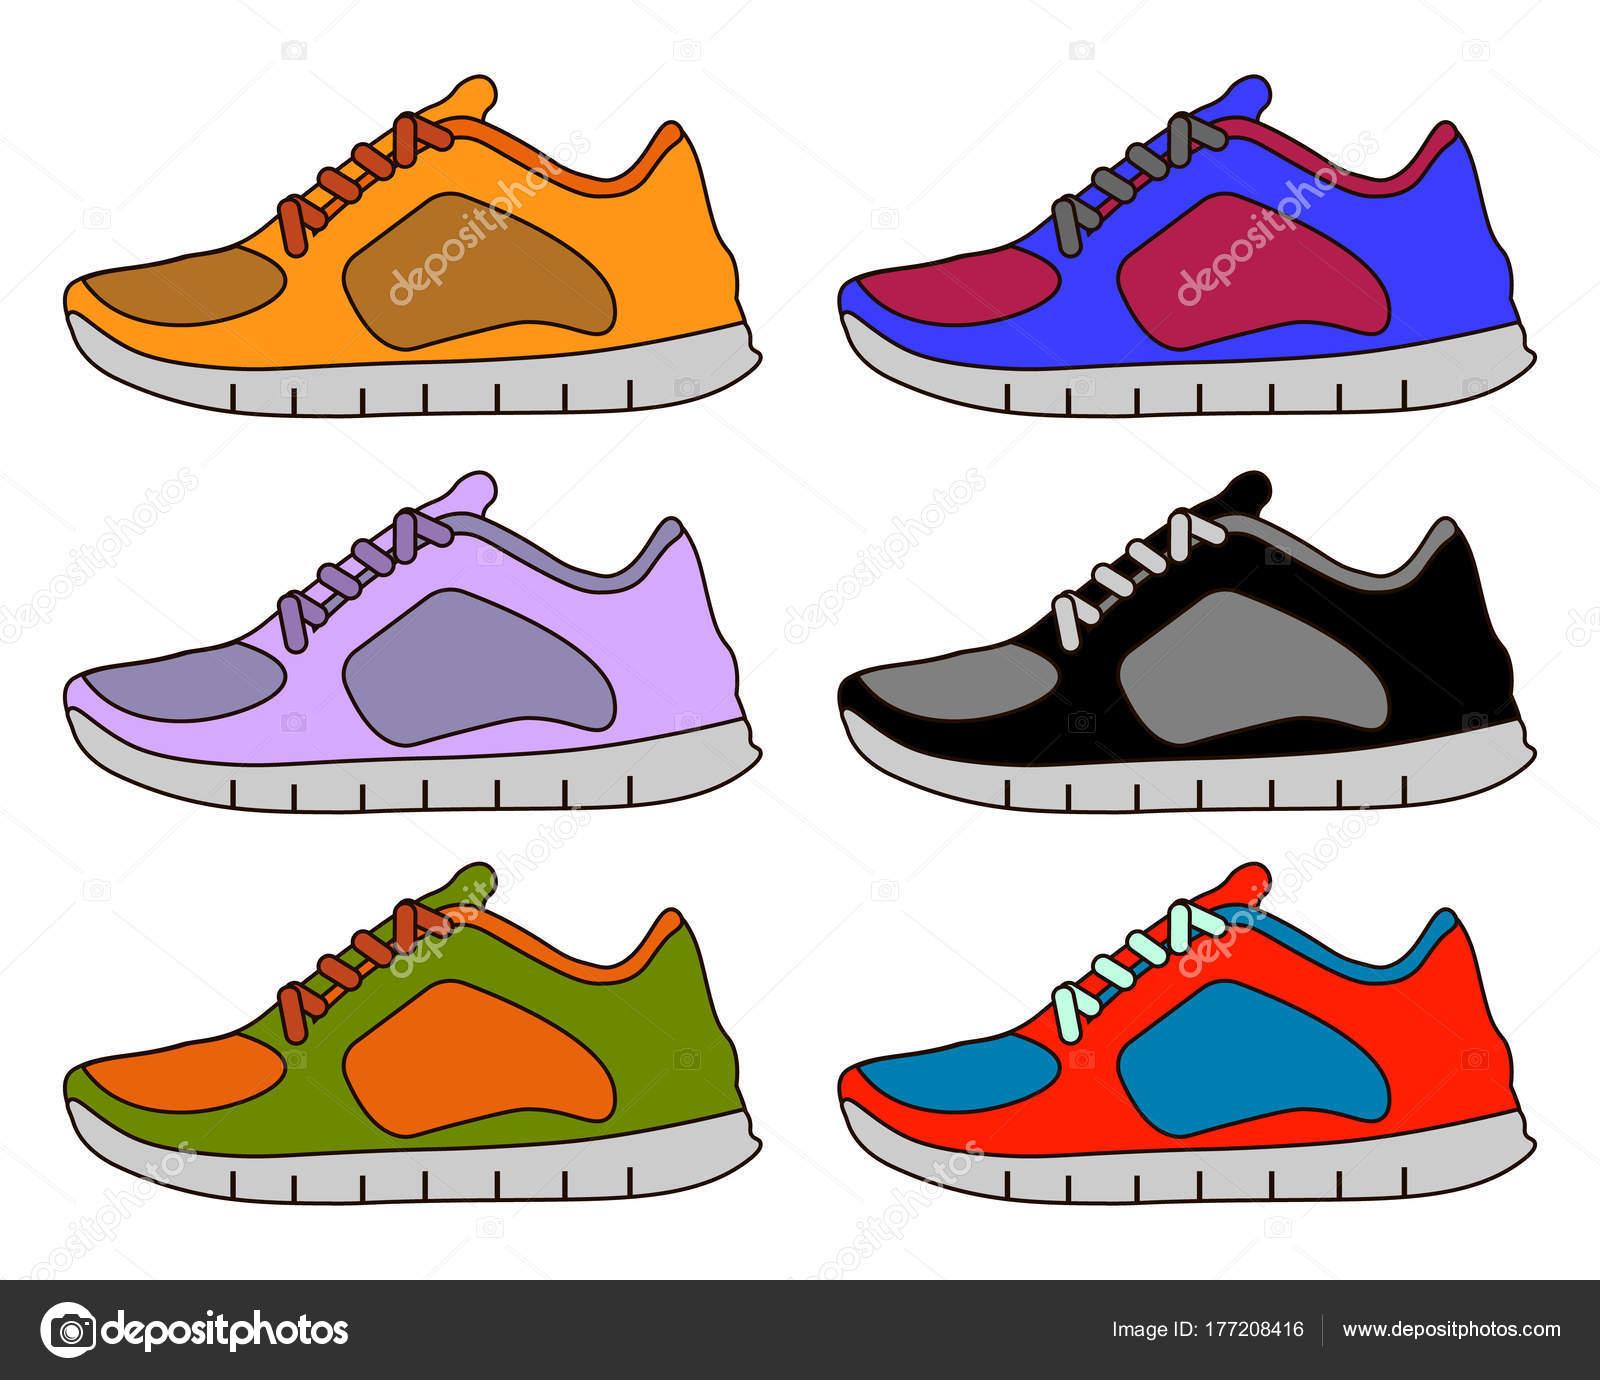 Basket chaussure ligne couleur minime ligne chaussure plate AVC ic?ne pictogramme 8d9cf1